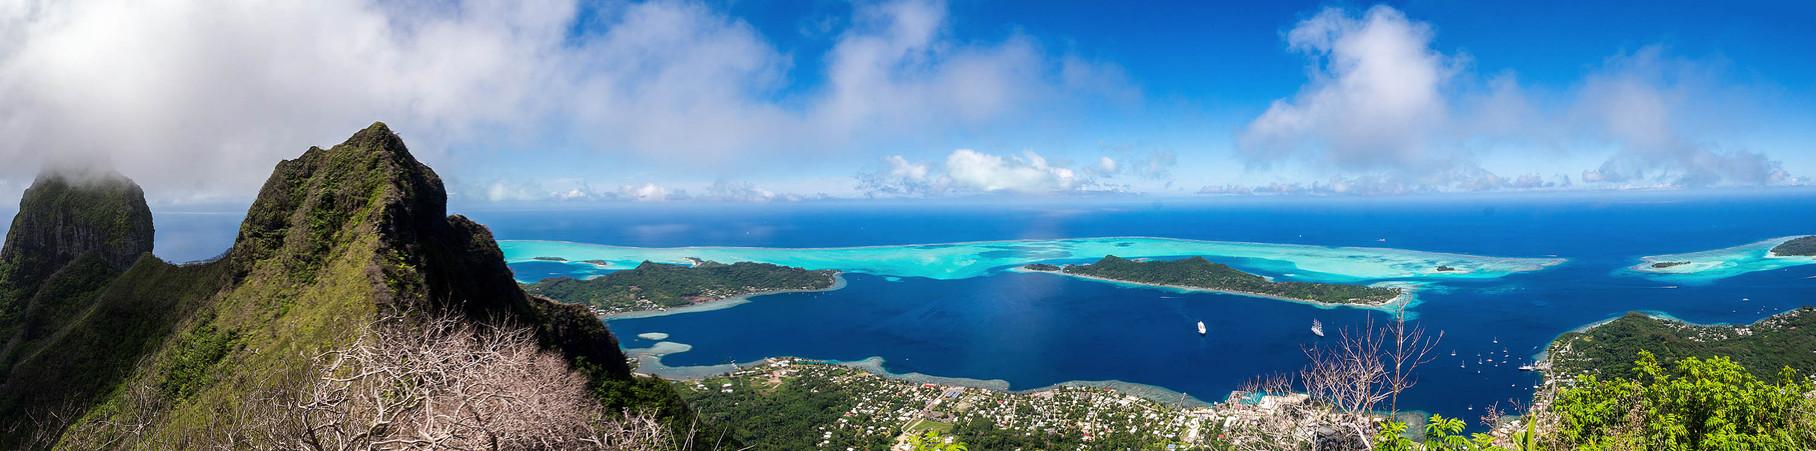 Panoramic view of Bora Bora from Mount Ohue (619masl)  [French Polynesia, 2014]